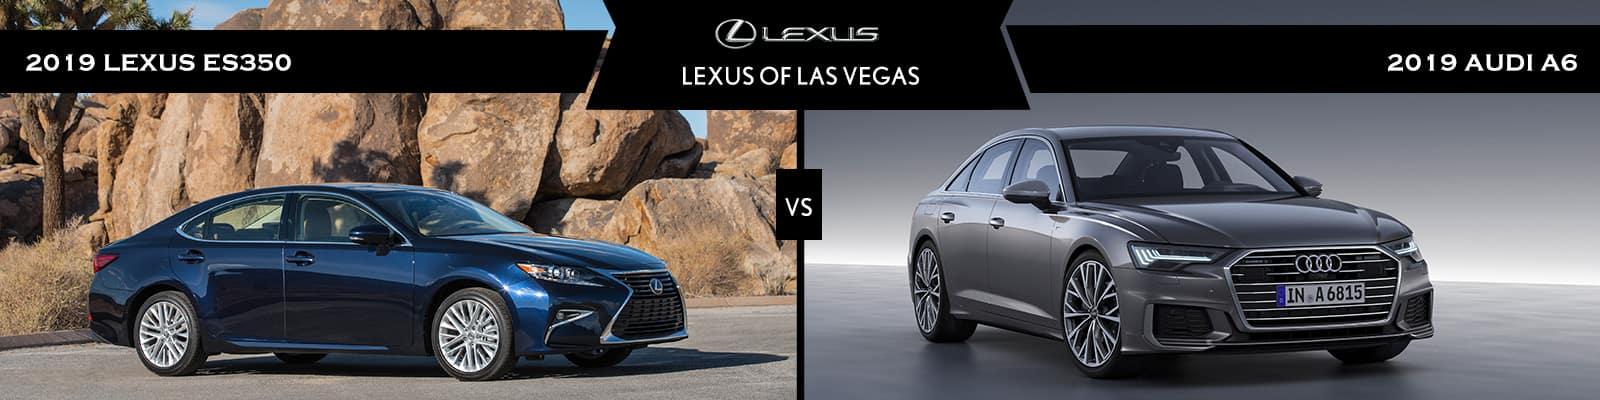 Lexus Vs Audi >> Lexus Es Vs Audi A6 Luxury Sedan Comparisons Las Vegas